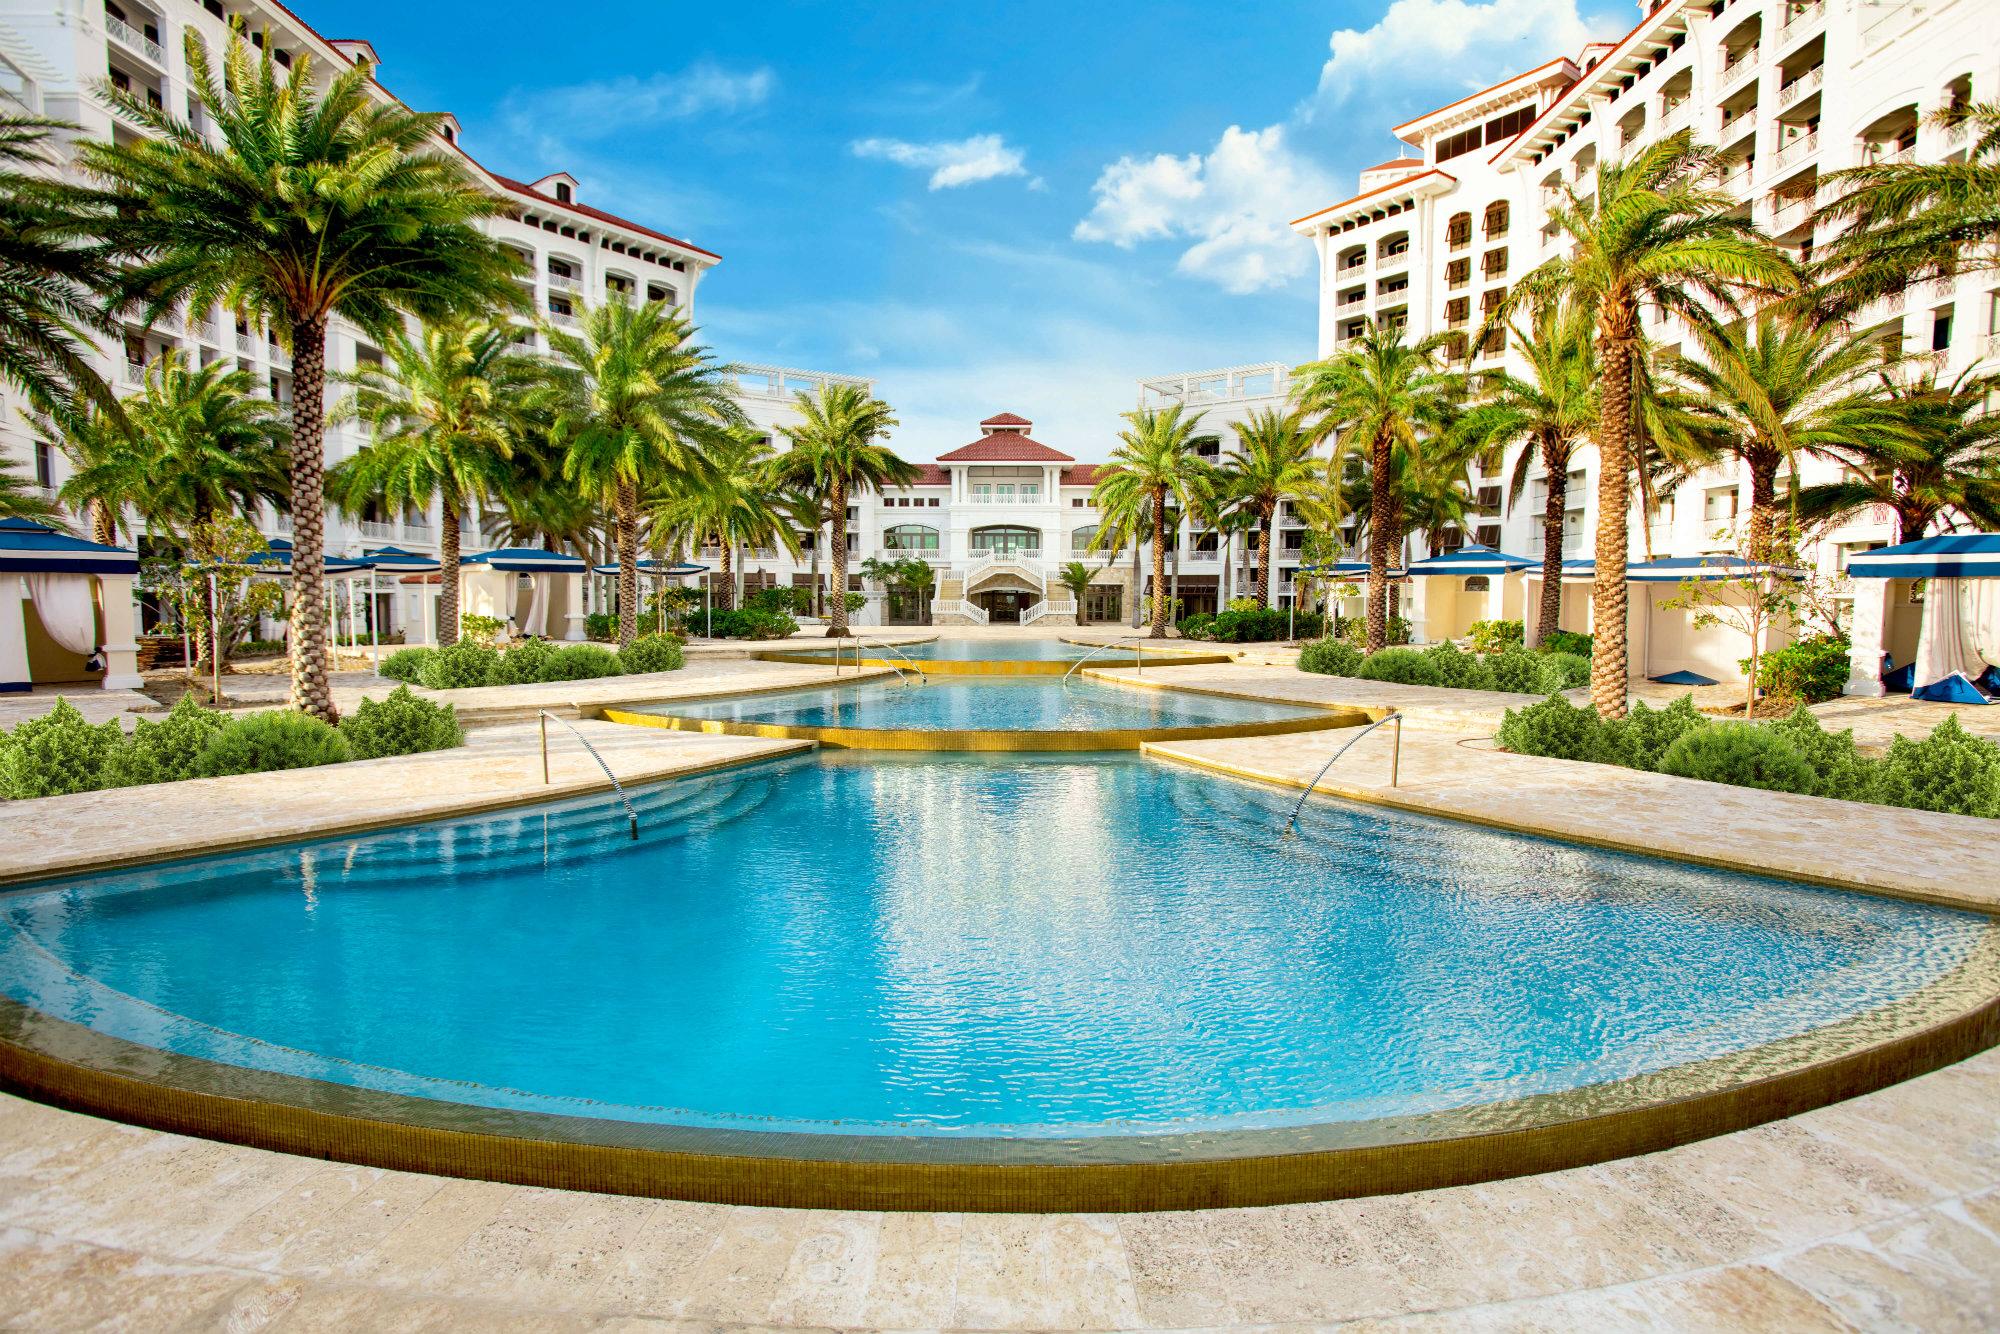 Baha Mar Resort In Nassau Bahamas Honored As Aquatics International Dream Design Aquatics International Magazine